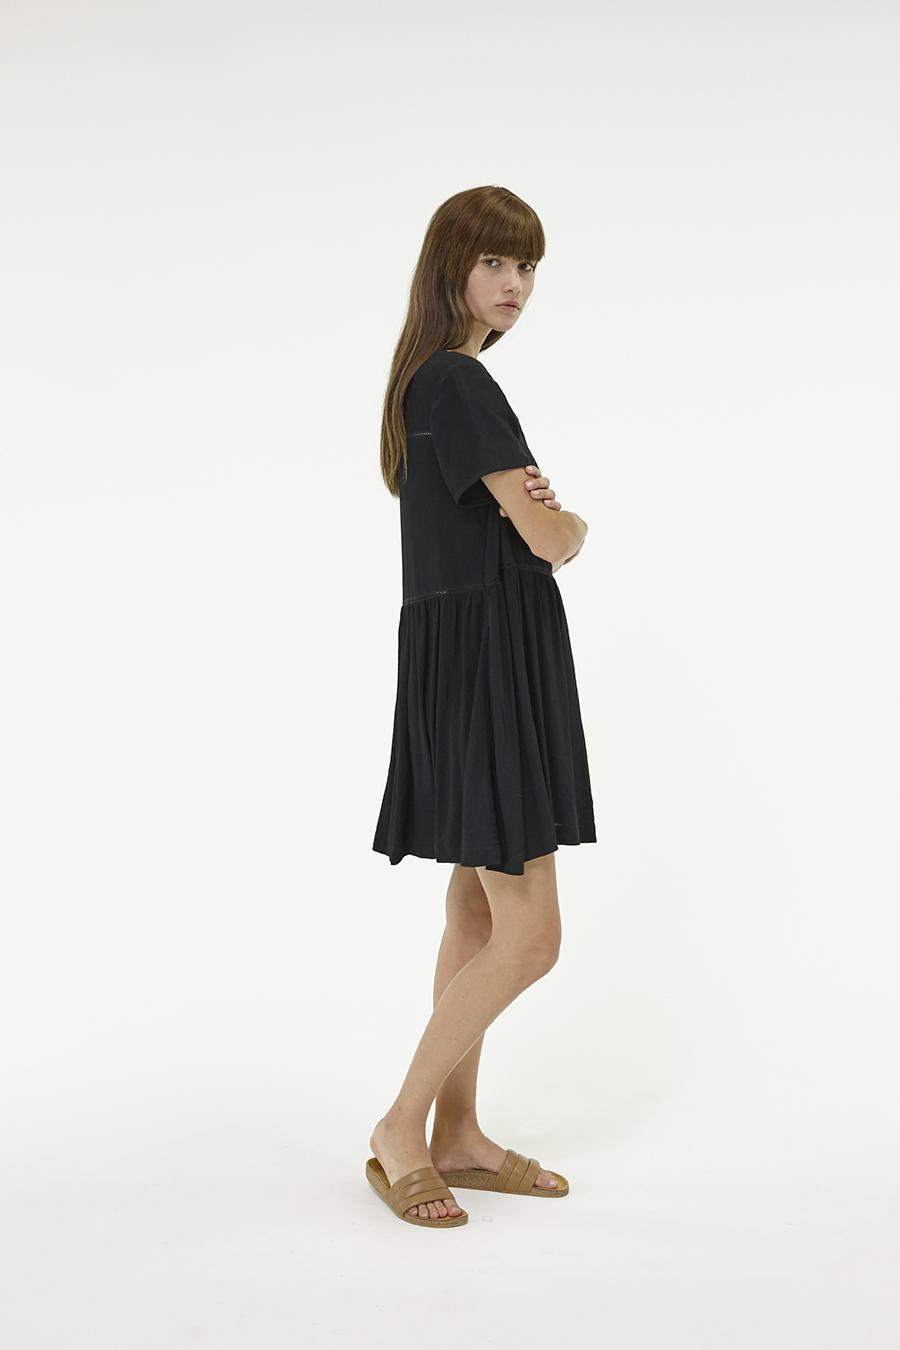 Huffer_Q3-16_W-Park-Dress_Black-04